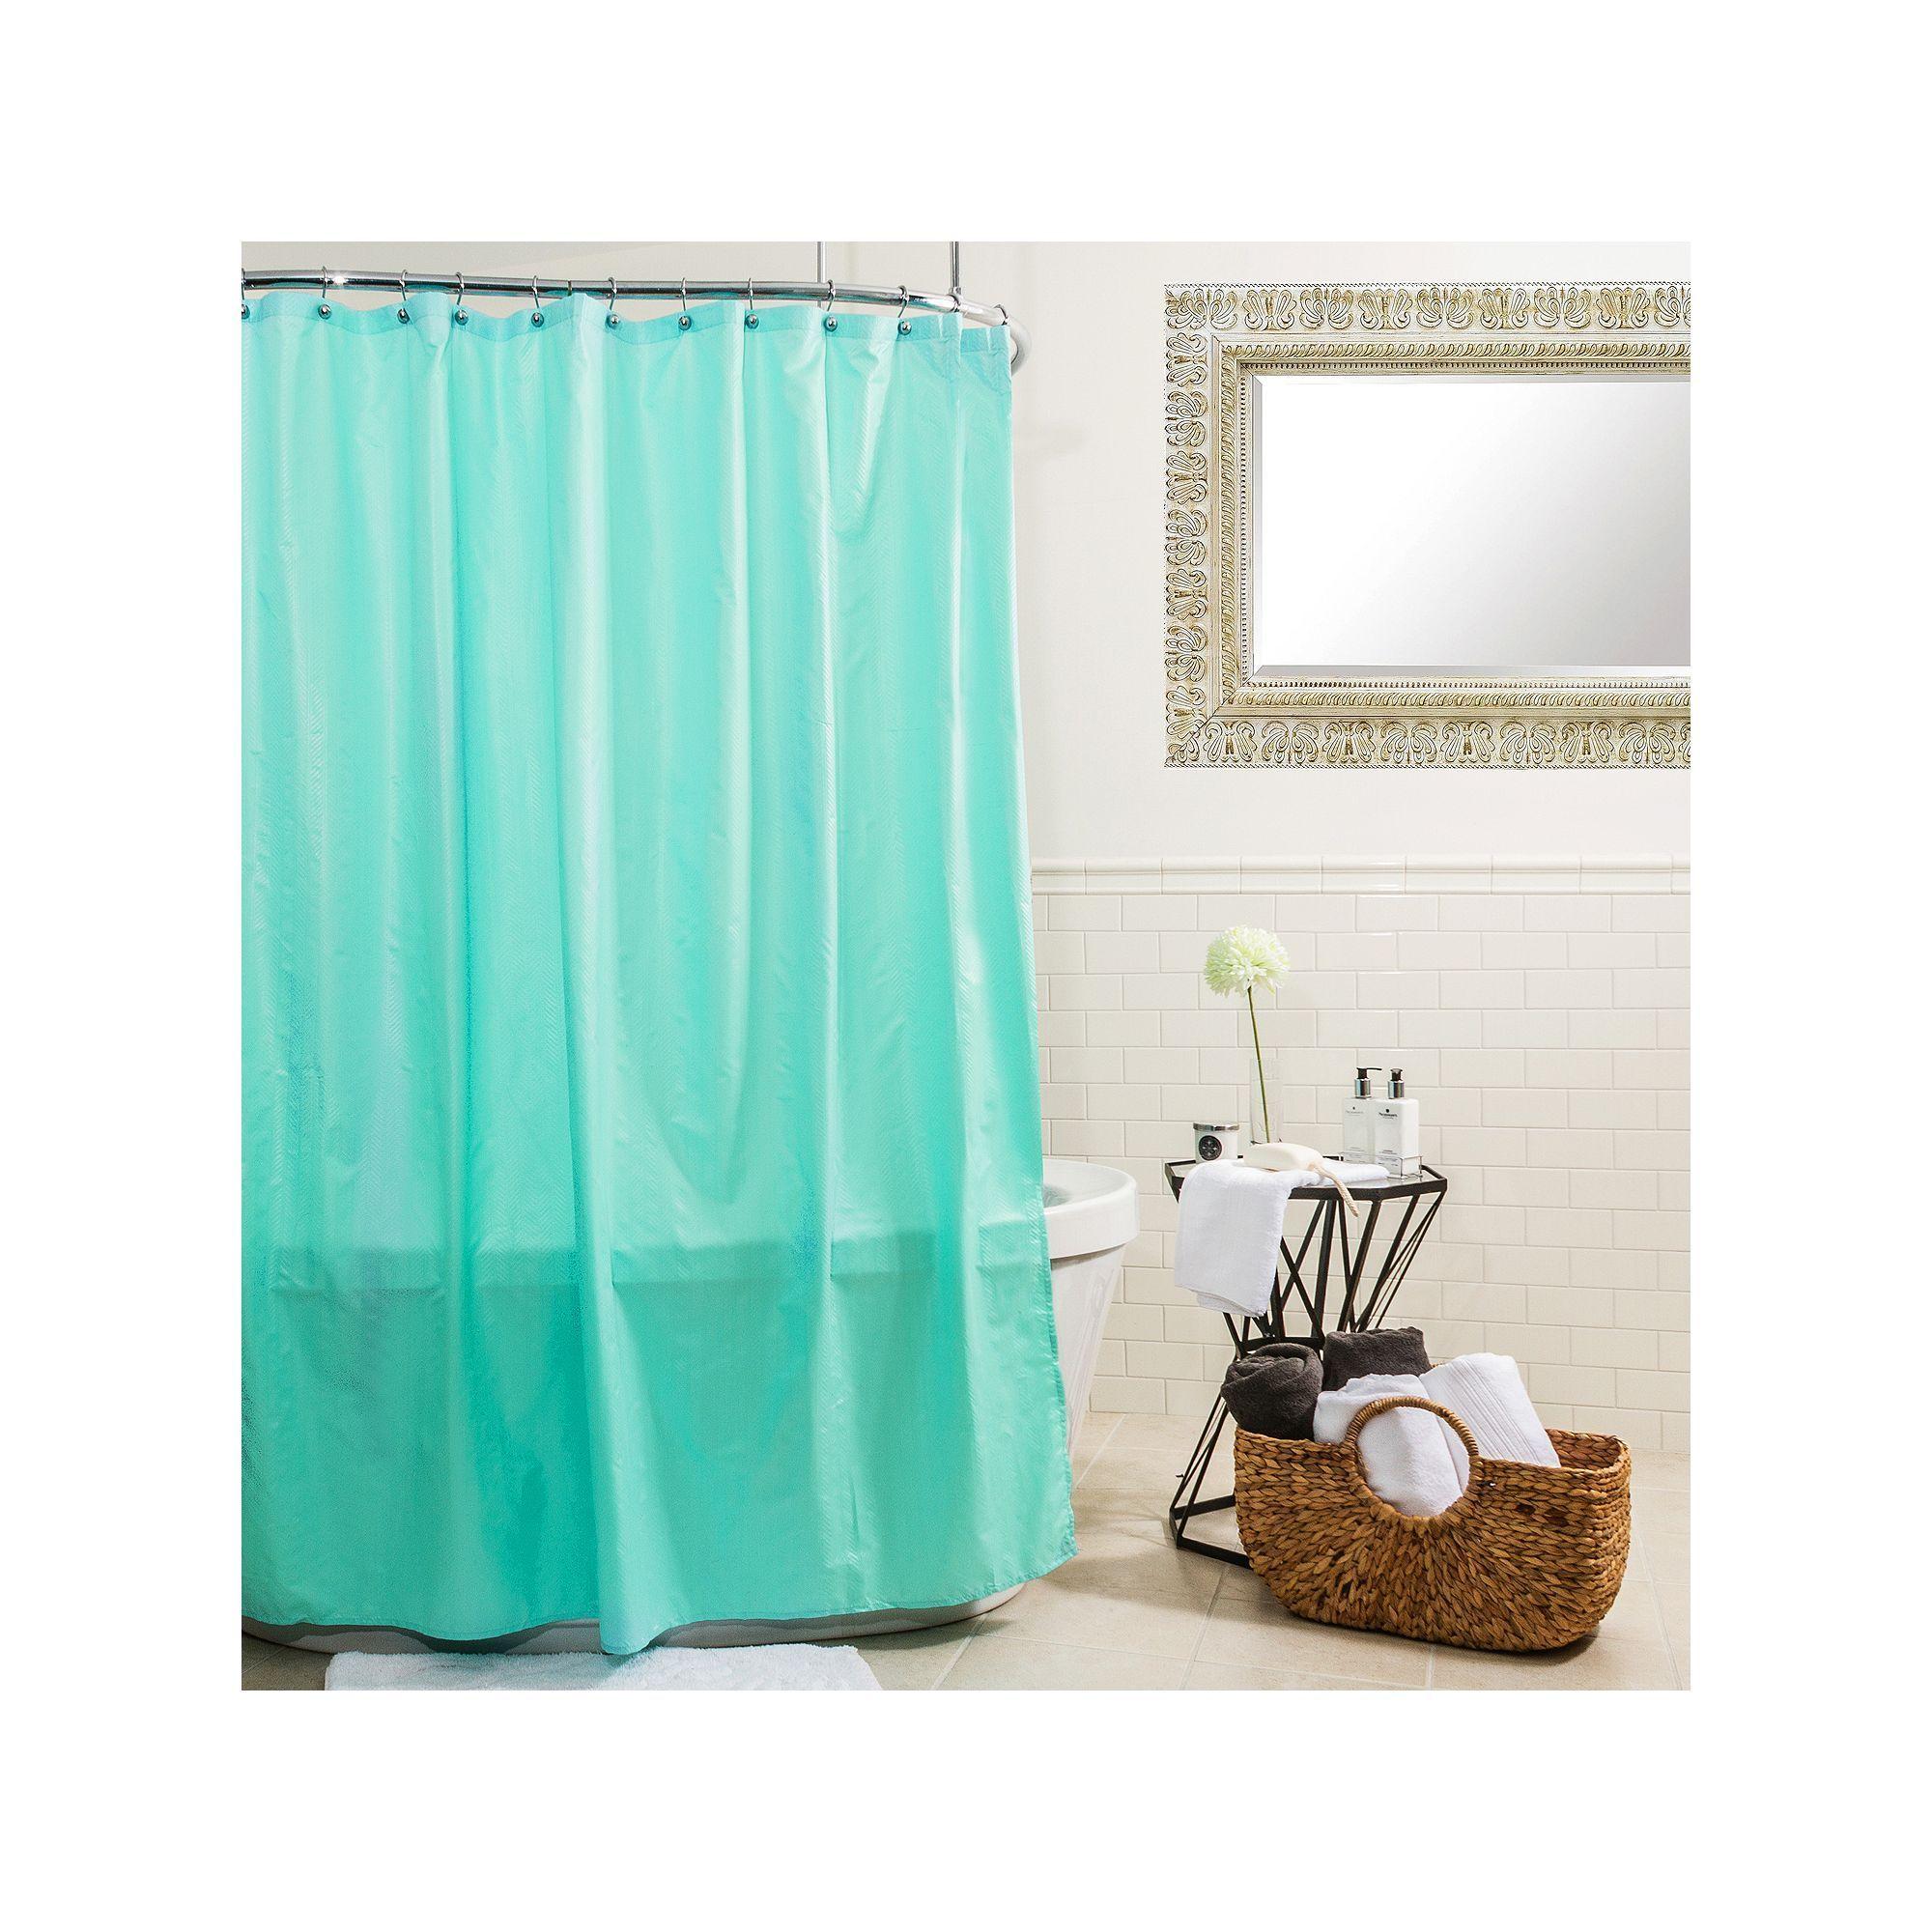 Splash Home Microfiber Shower Curtain Liner Shower Curtains Home